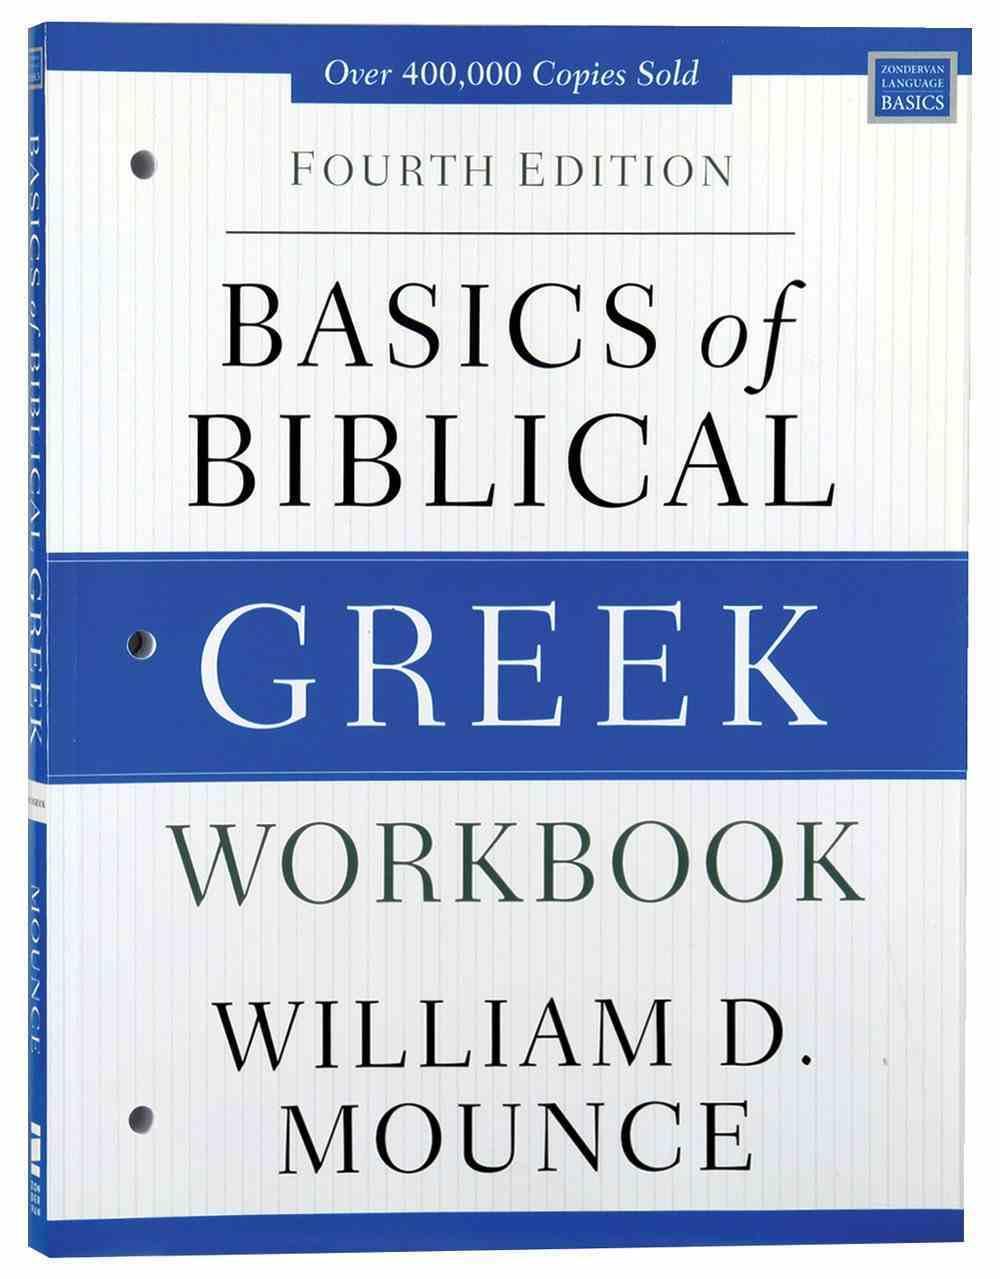 Basics of Biblical Greek (4th Edition) (Workbook) Paperback